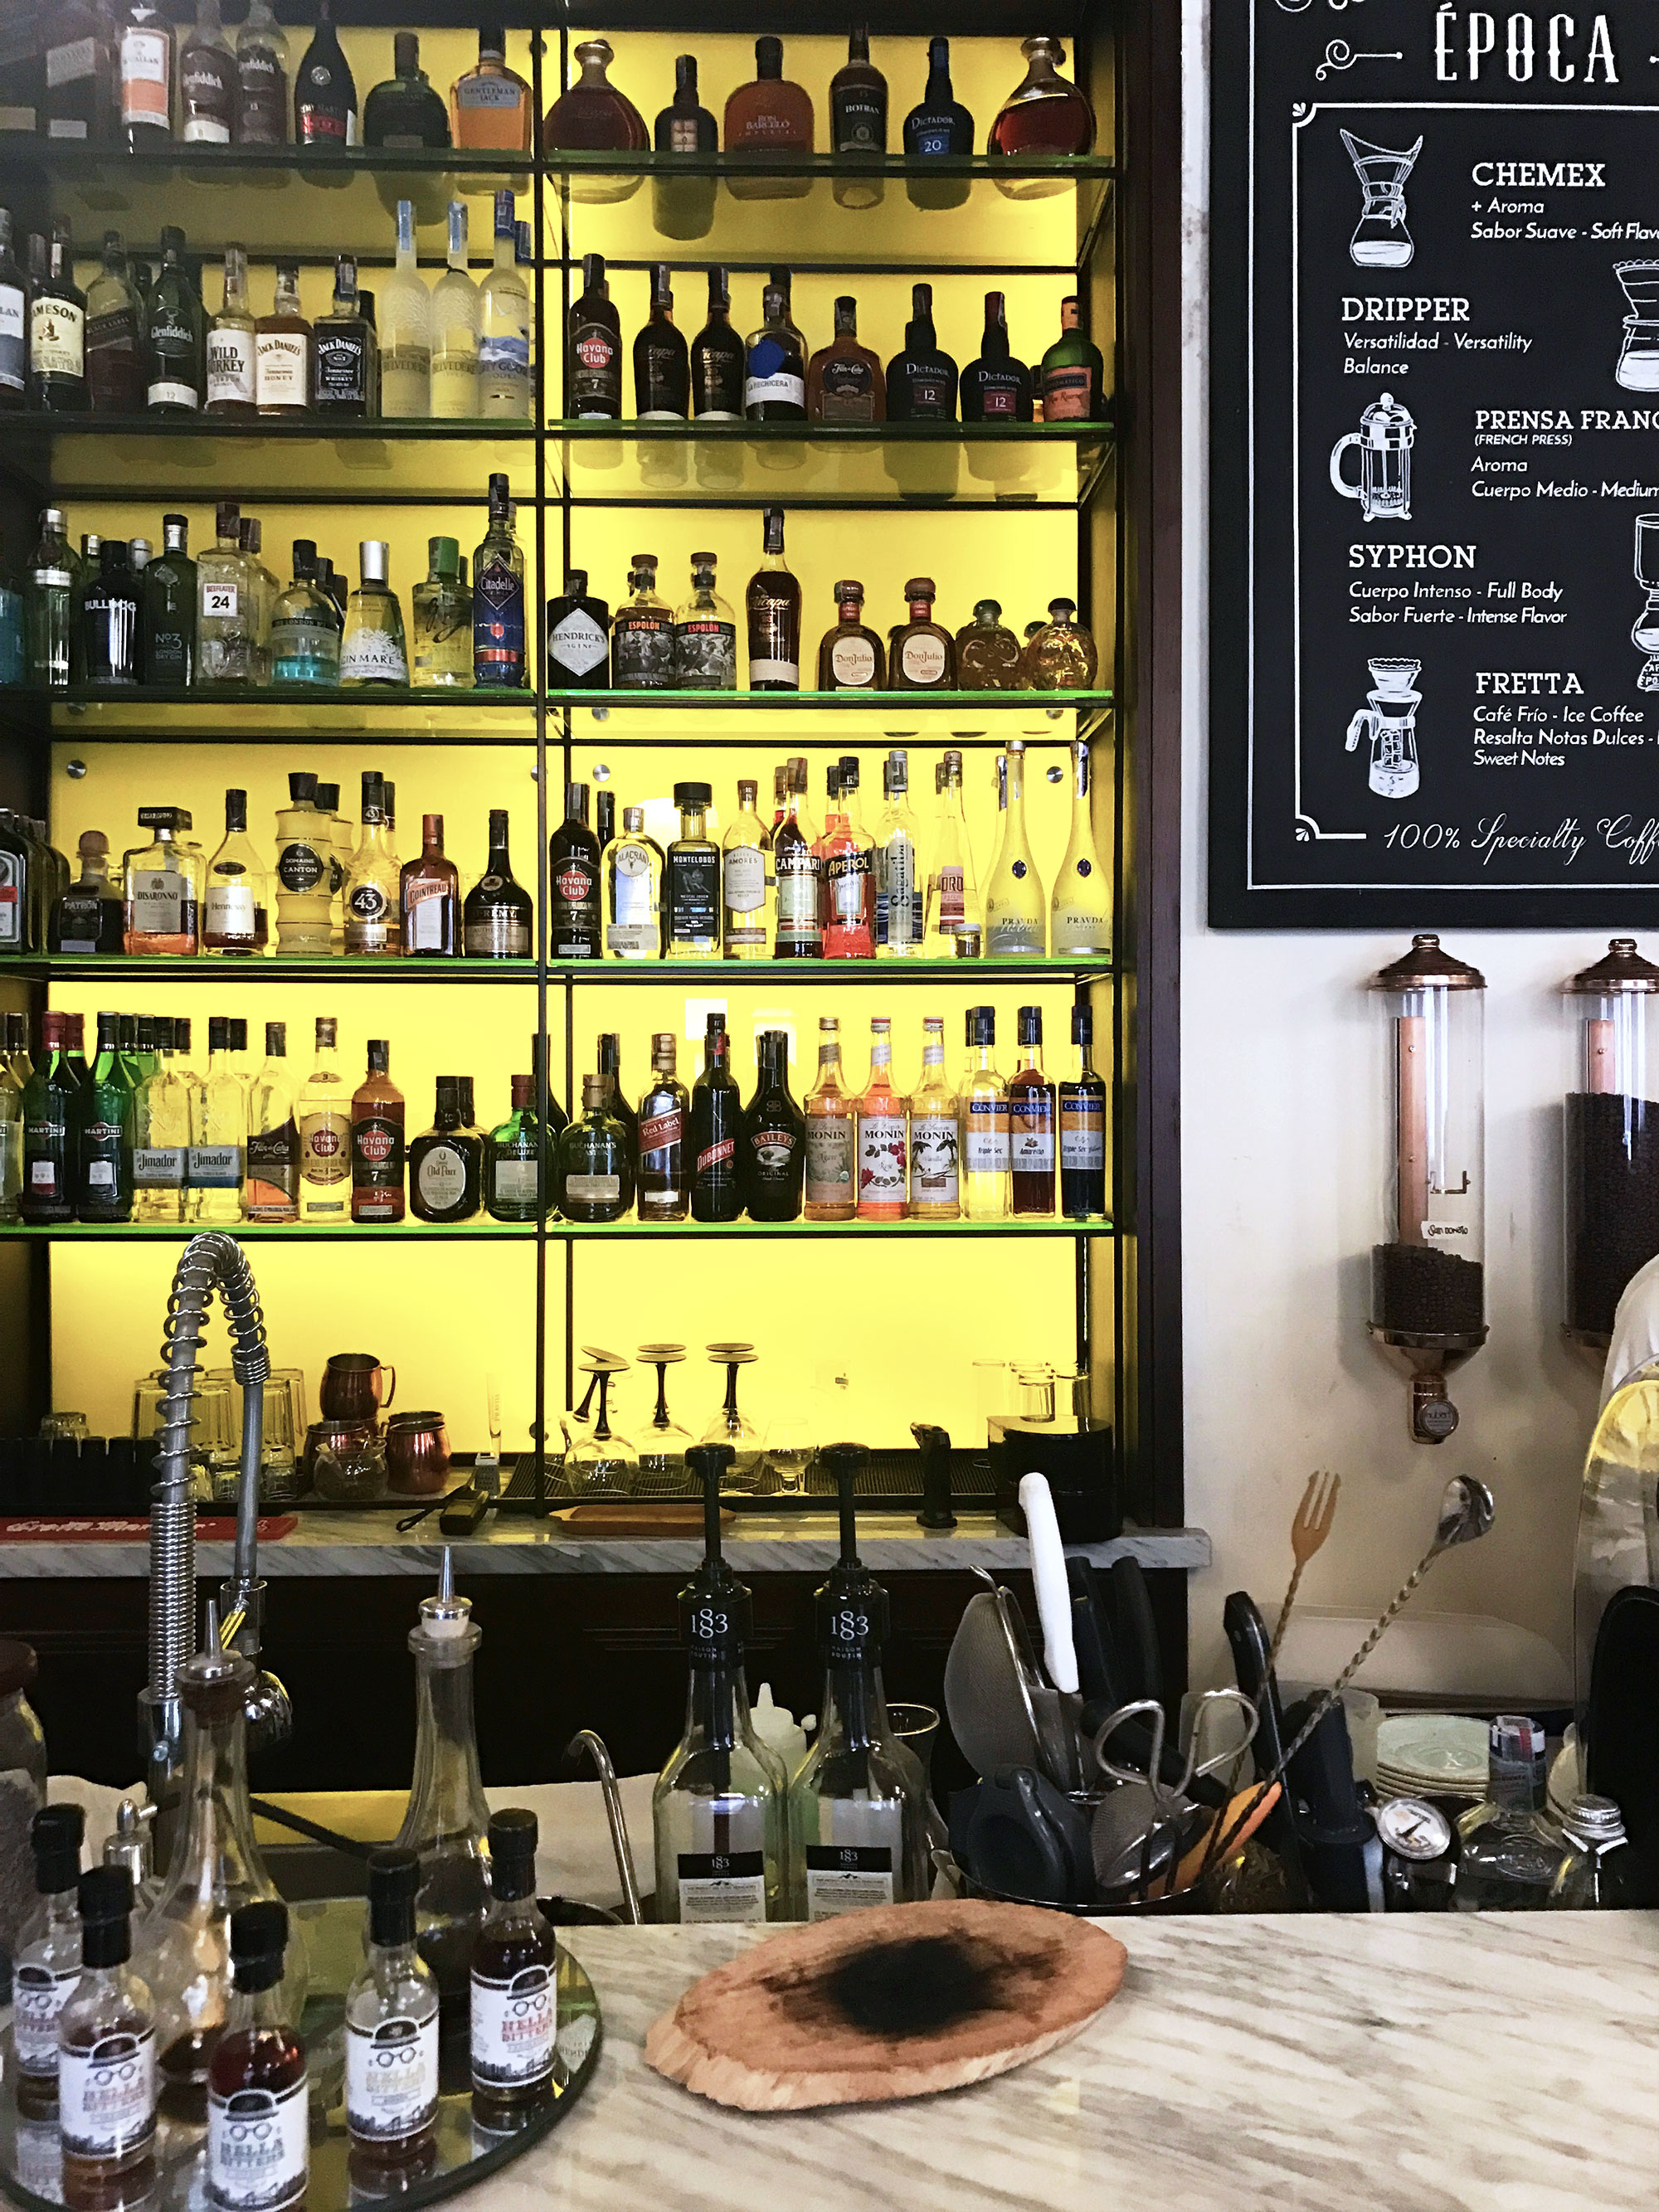 Cartagena cafe | pictures of Cartagena, Colombia